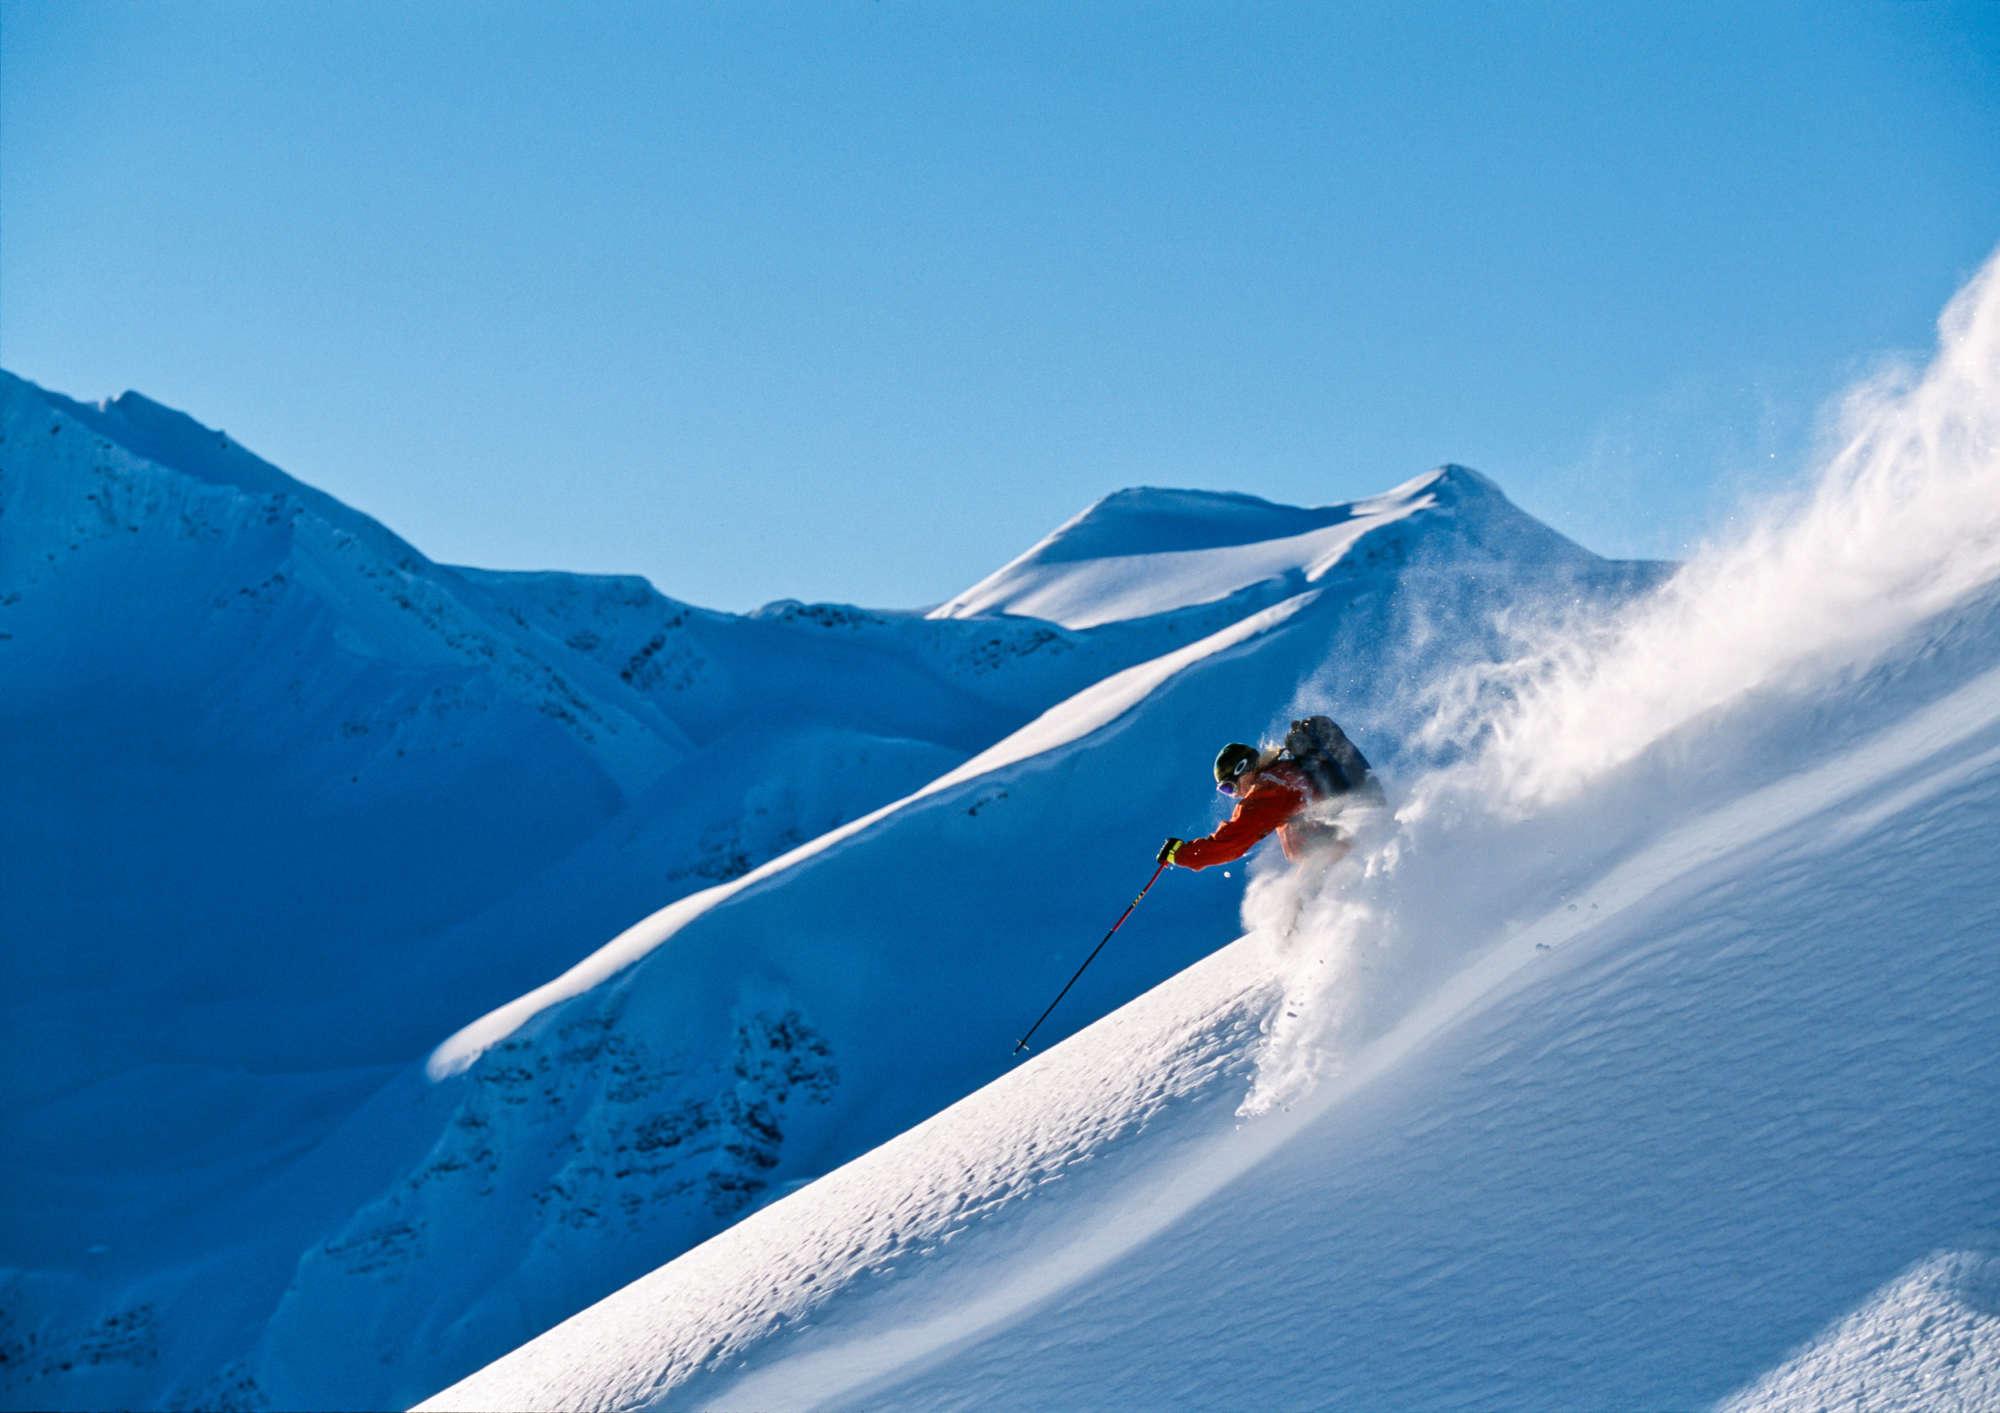 Big alpine heli skiing in Canada.